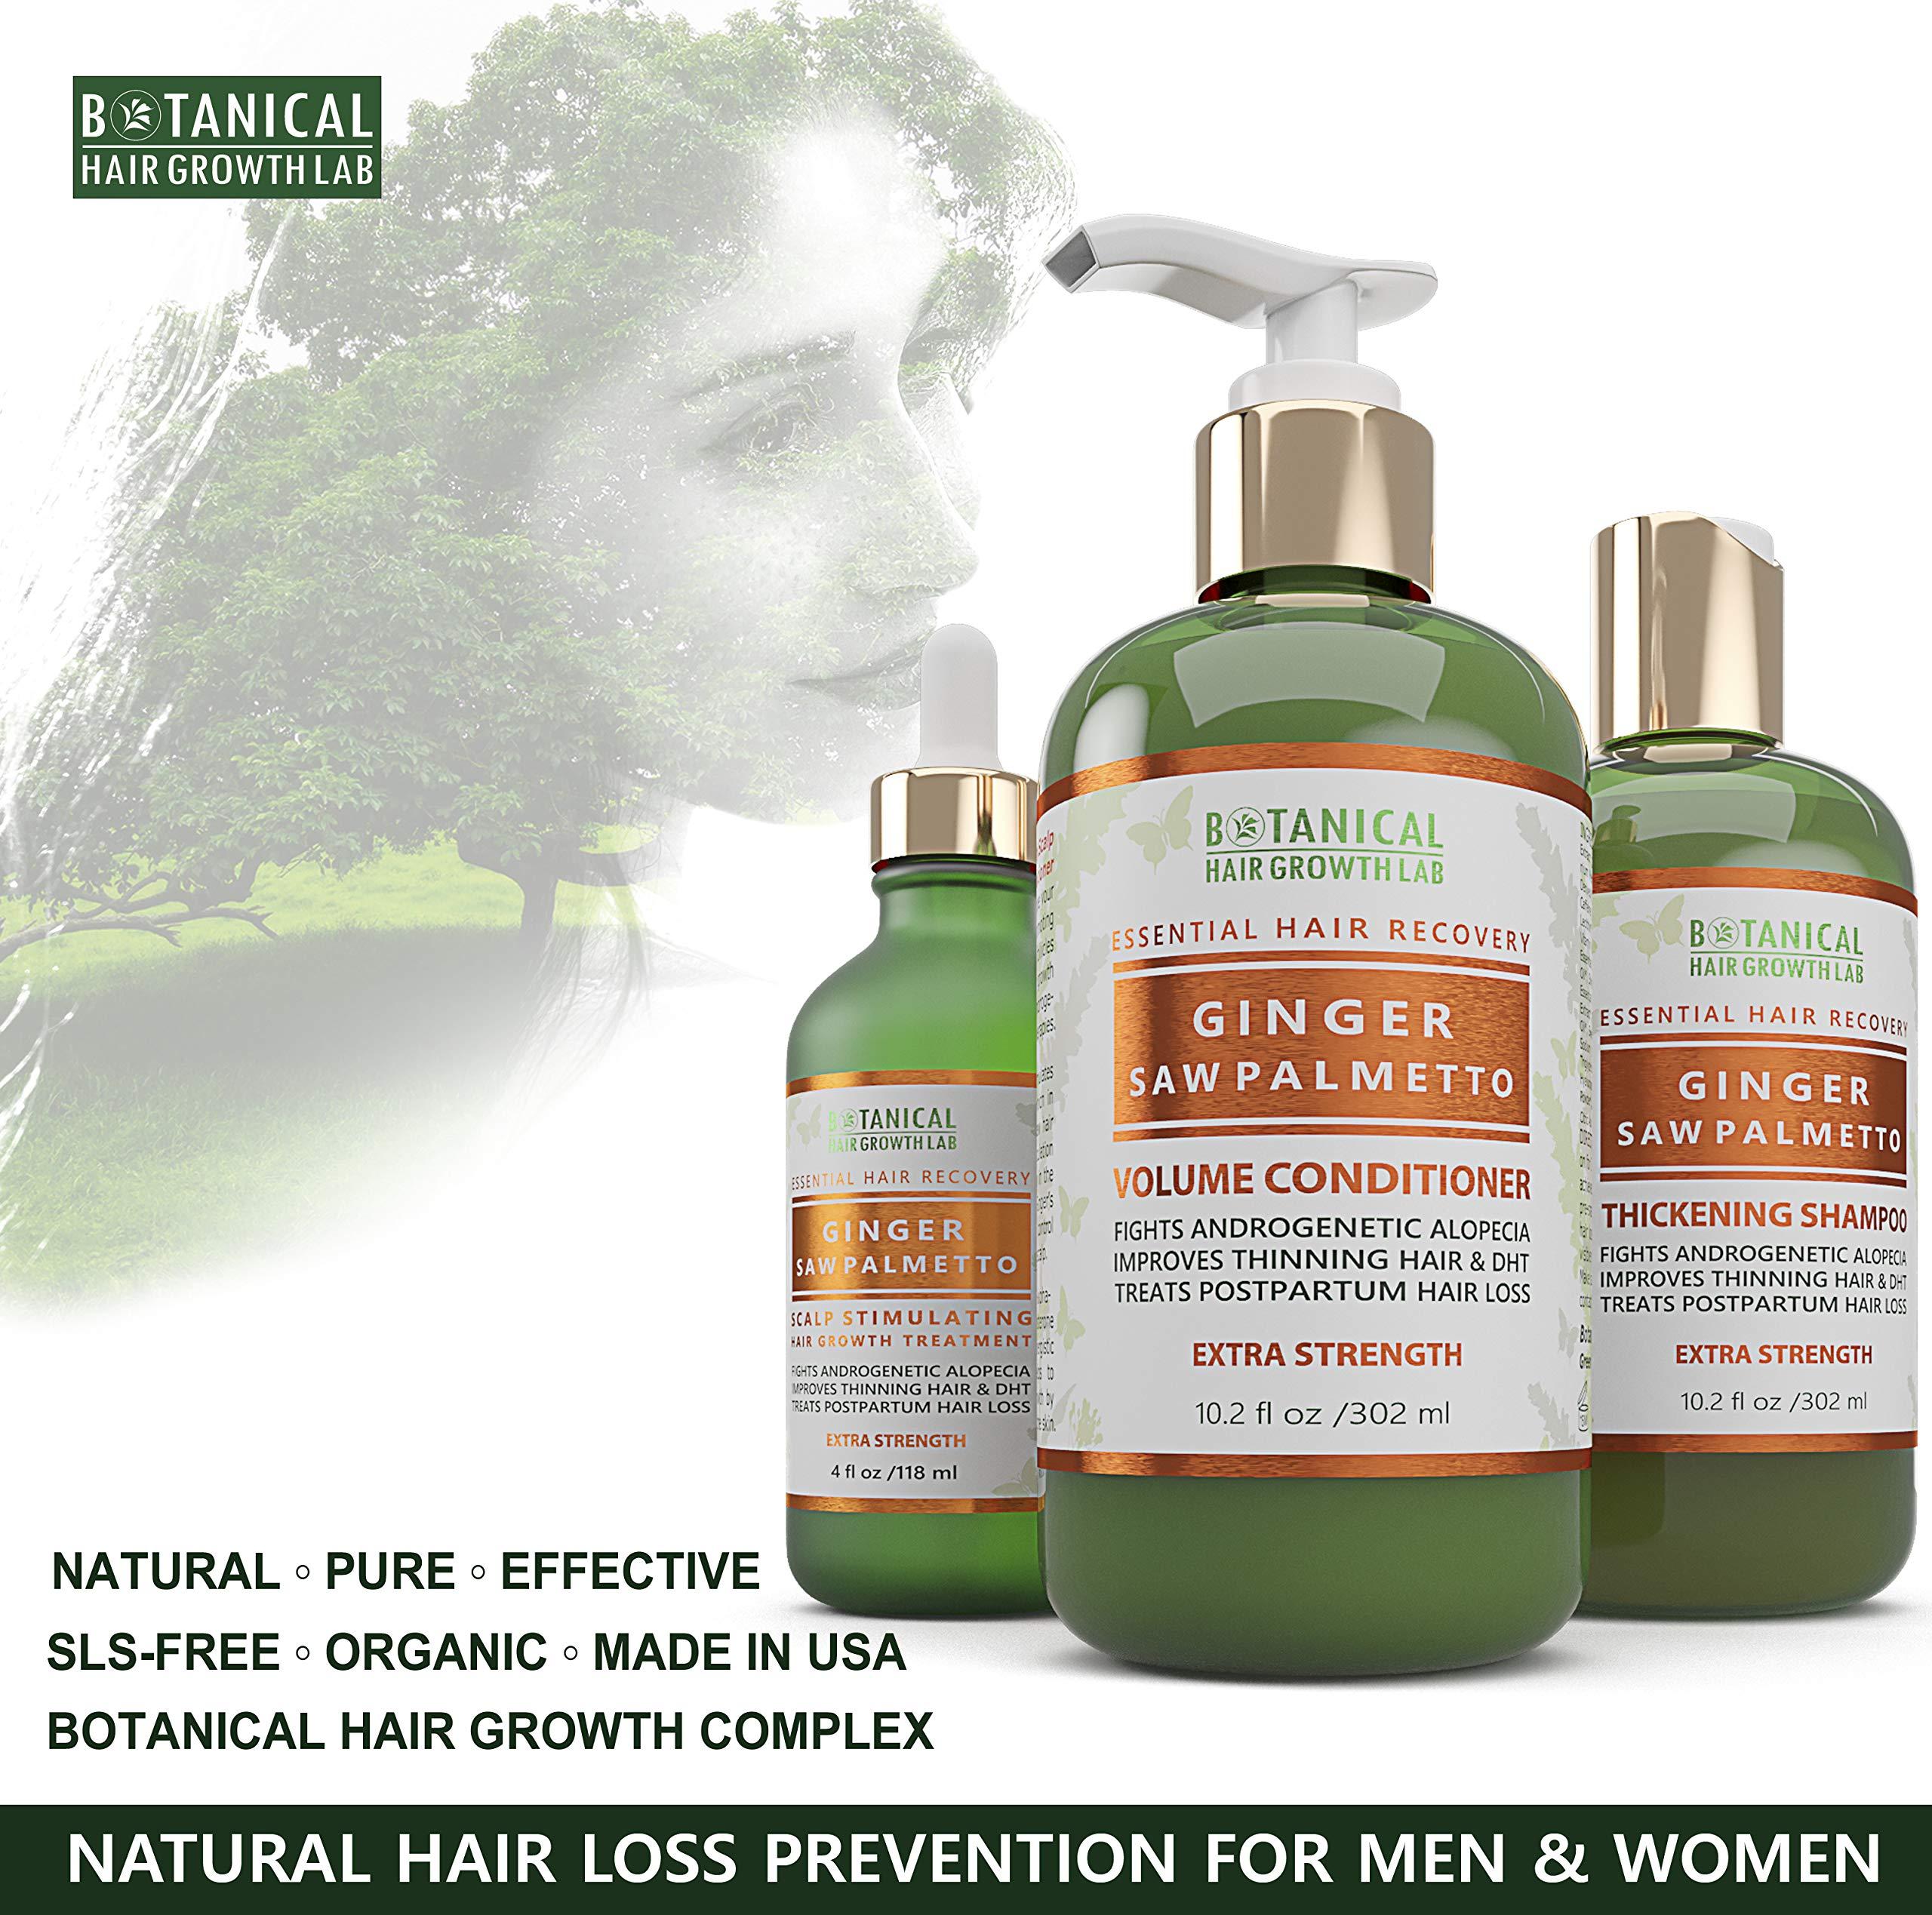 Botanical Hair Growth Lab Anti Hair Loss Shampoo Ginger - Saw Palmetto Organic Thickening Shampoo For Hair Thinning Prevention Alopecia Postpartum DHT Blocking 10.2 Fl Oz by BOTANICAL HAIR GROWTH LAB